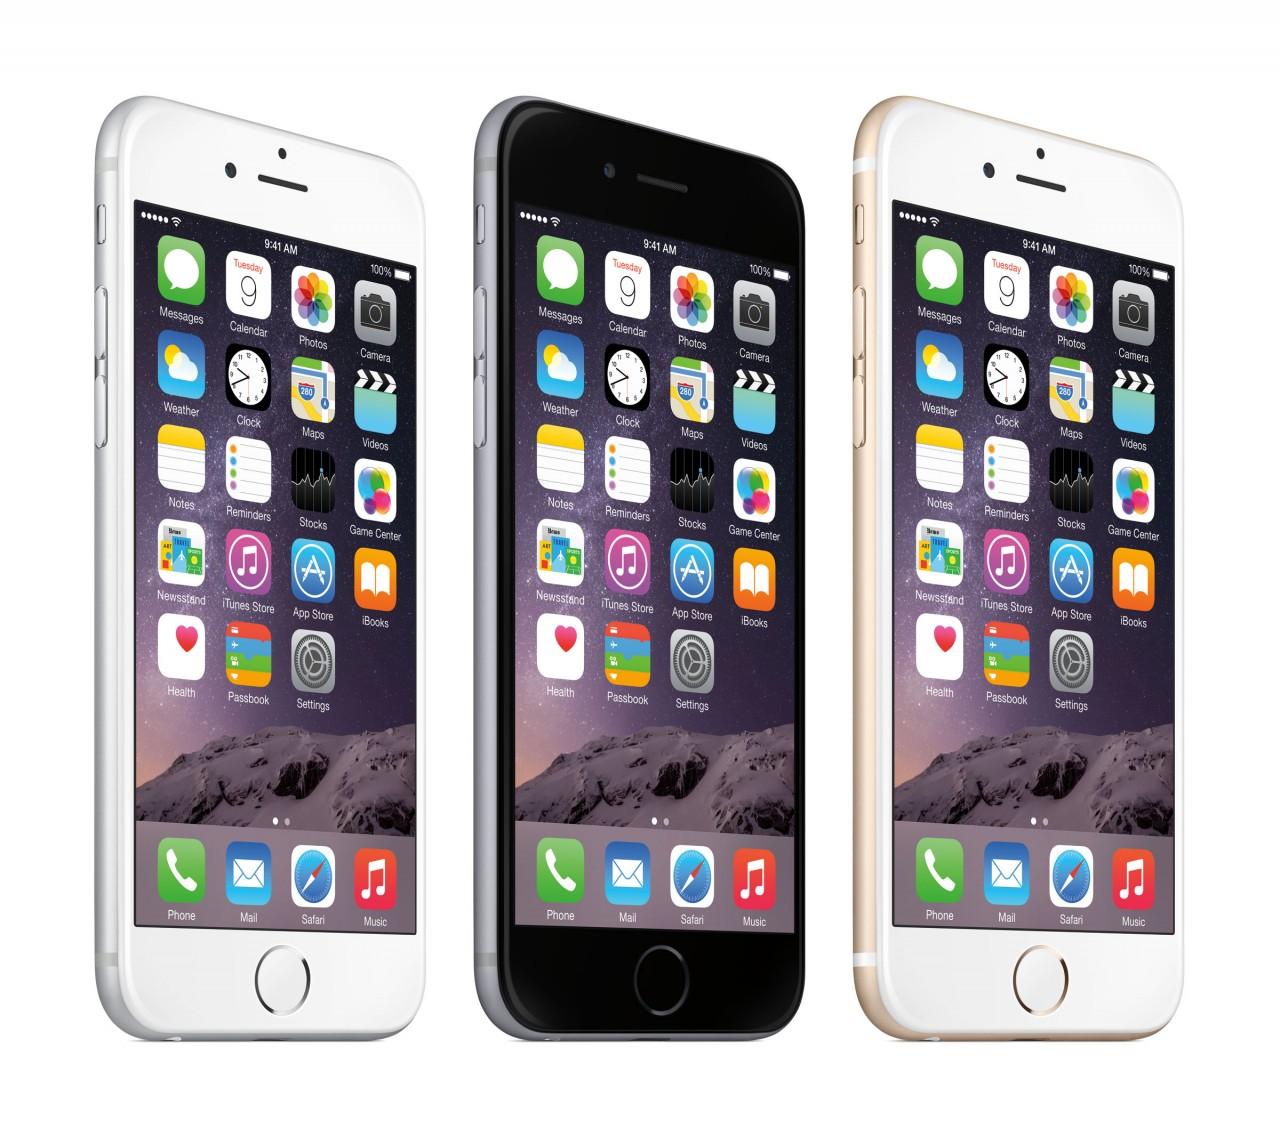 iPhone-6-colors-press-image-1280x1137